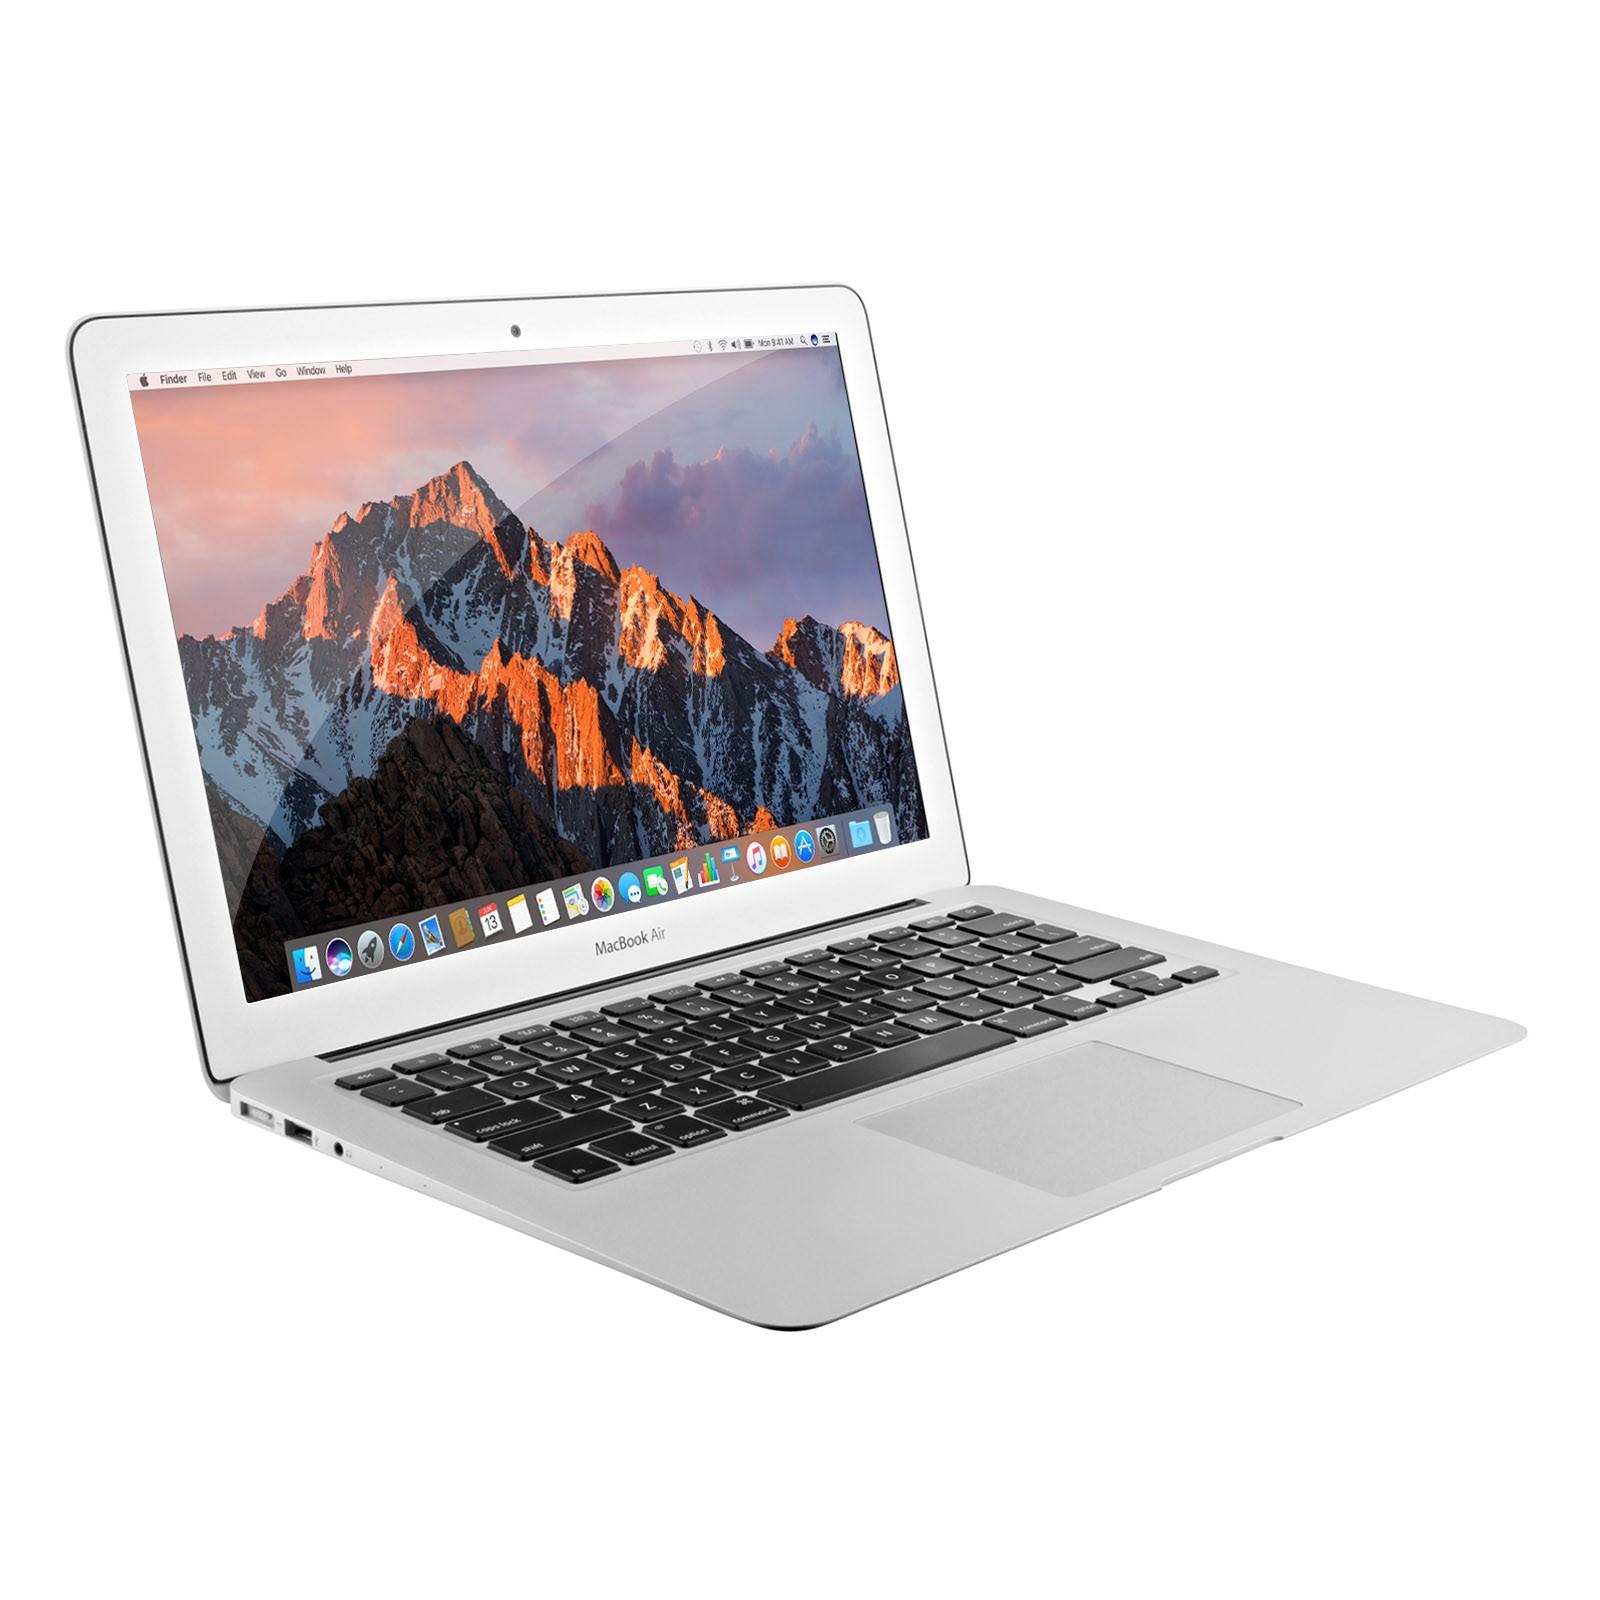 "Apple Macbook AIR 13.3 "" 1.3GHZ Intel Core I5 Notebook Co..."